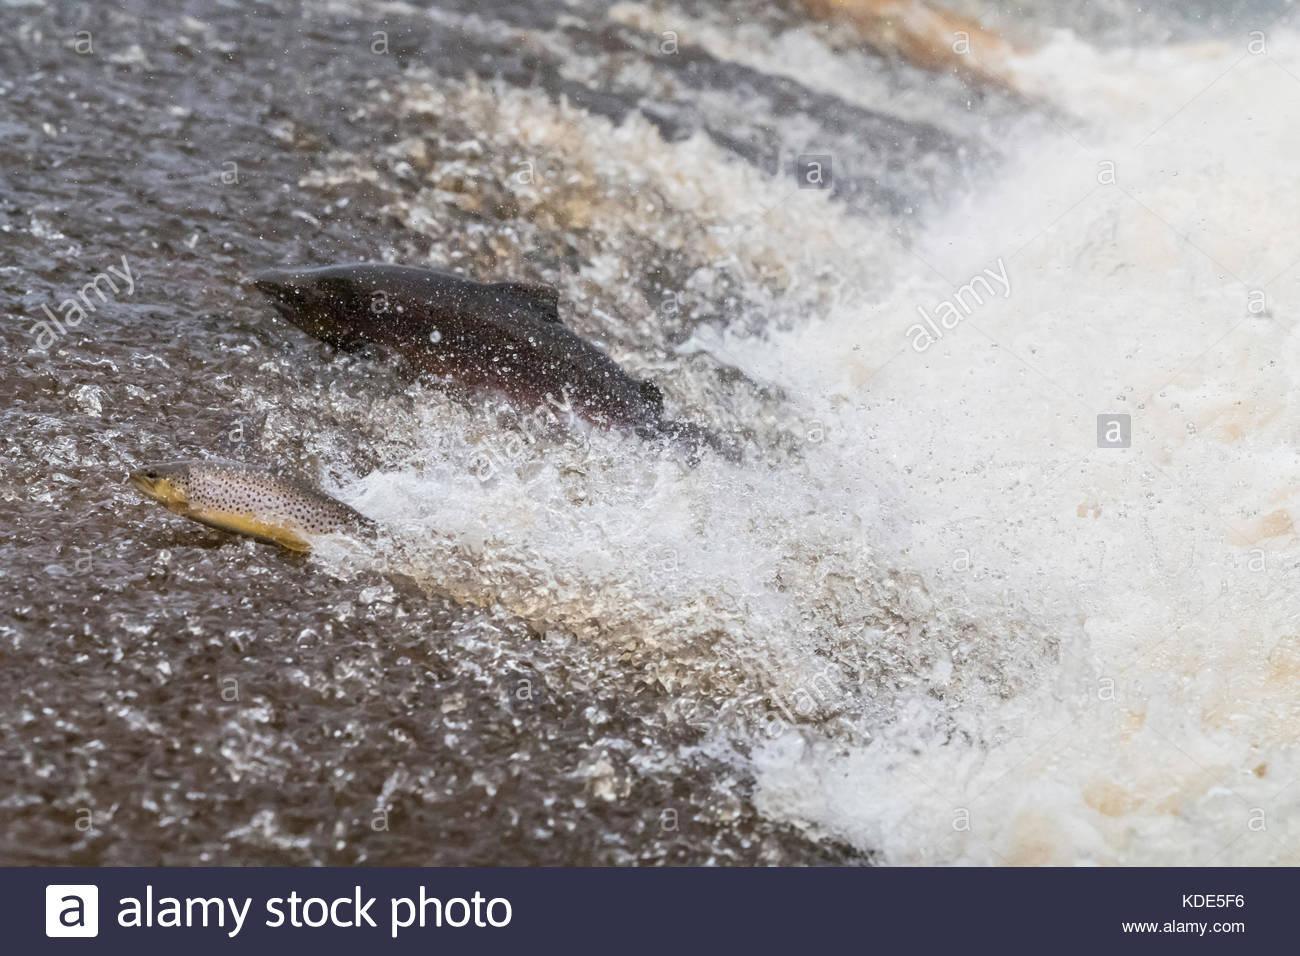 Selkirk, Scottish Borders, UK. 13th Oct, 2017. An Atlantic Salmon (Salmo salar) and Brown Trout )Salmo trutta) leap - Stock Image